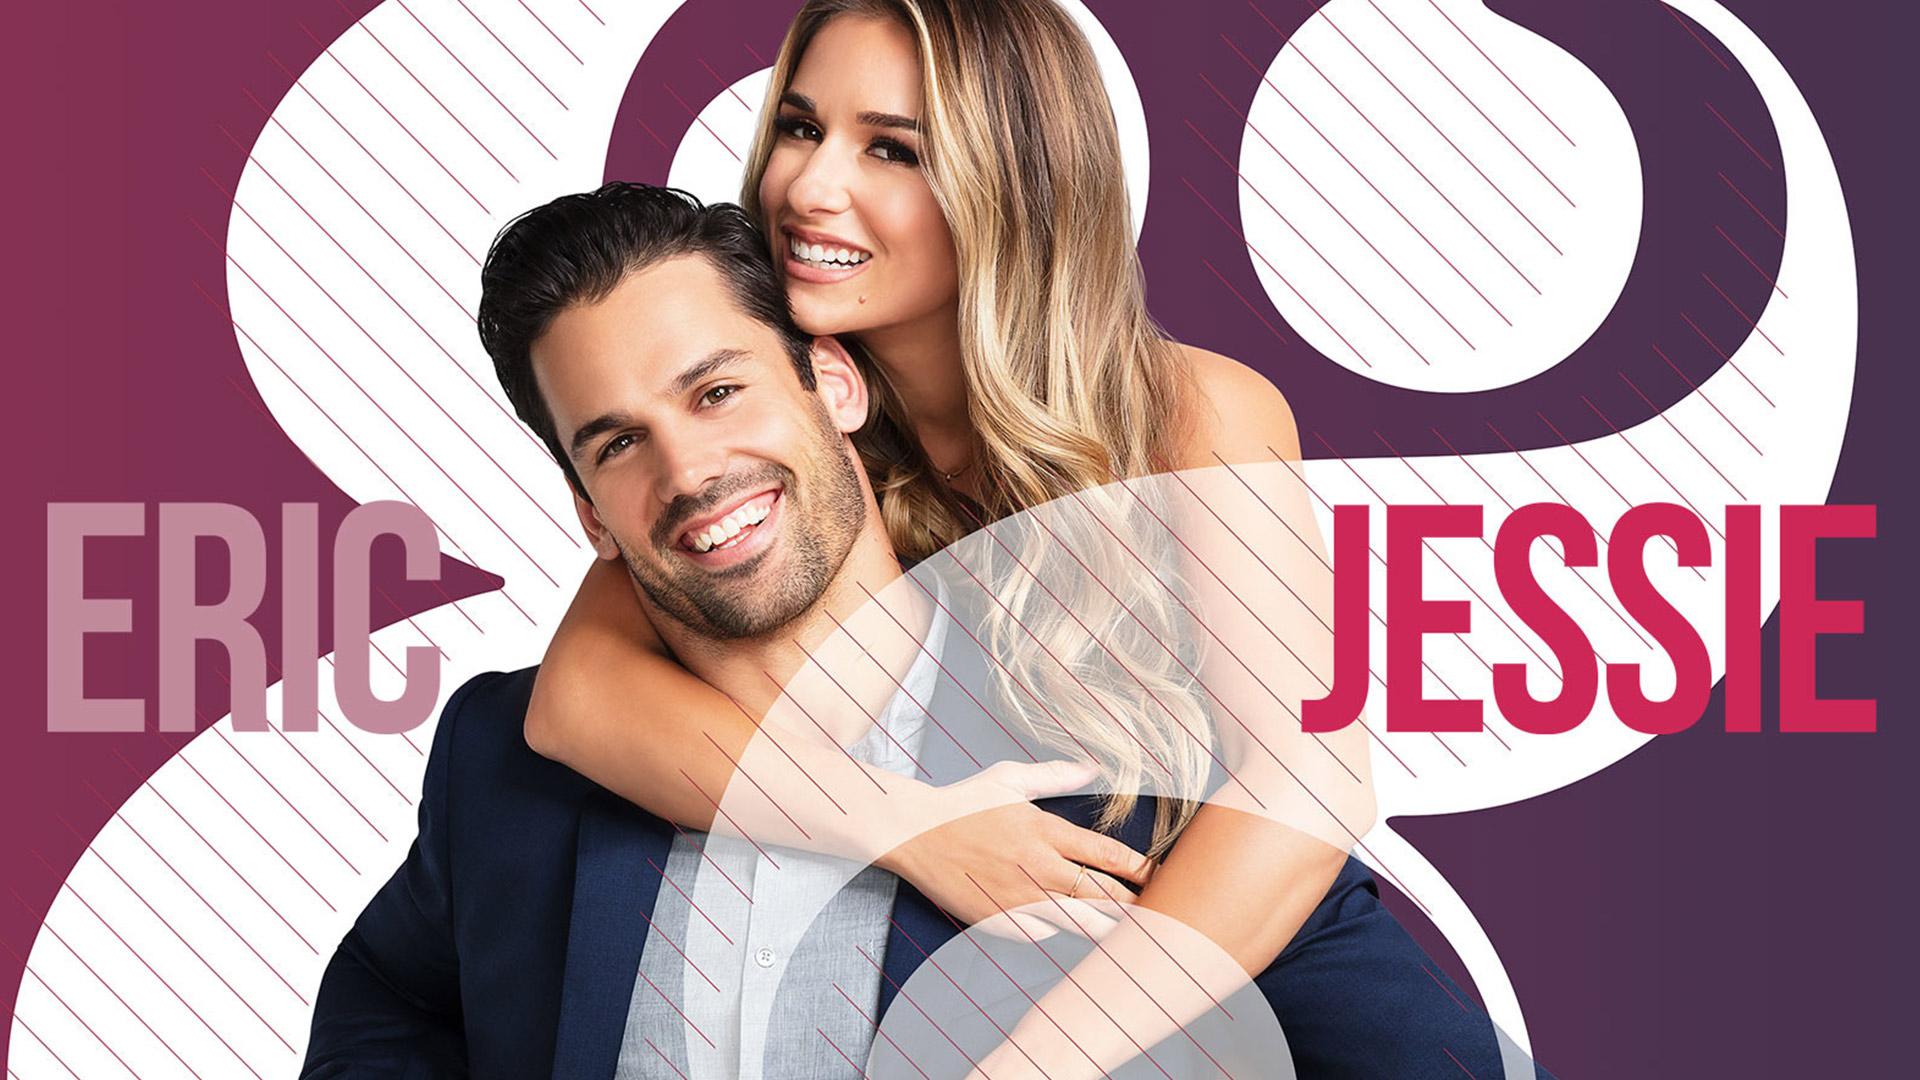 Eric & Jessie, Season 3